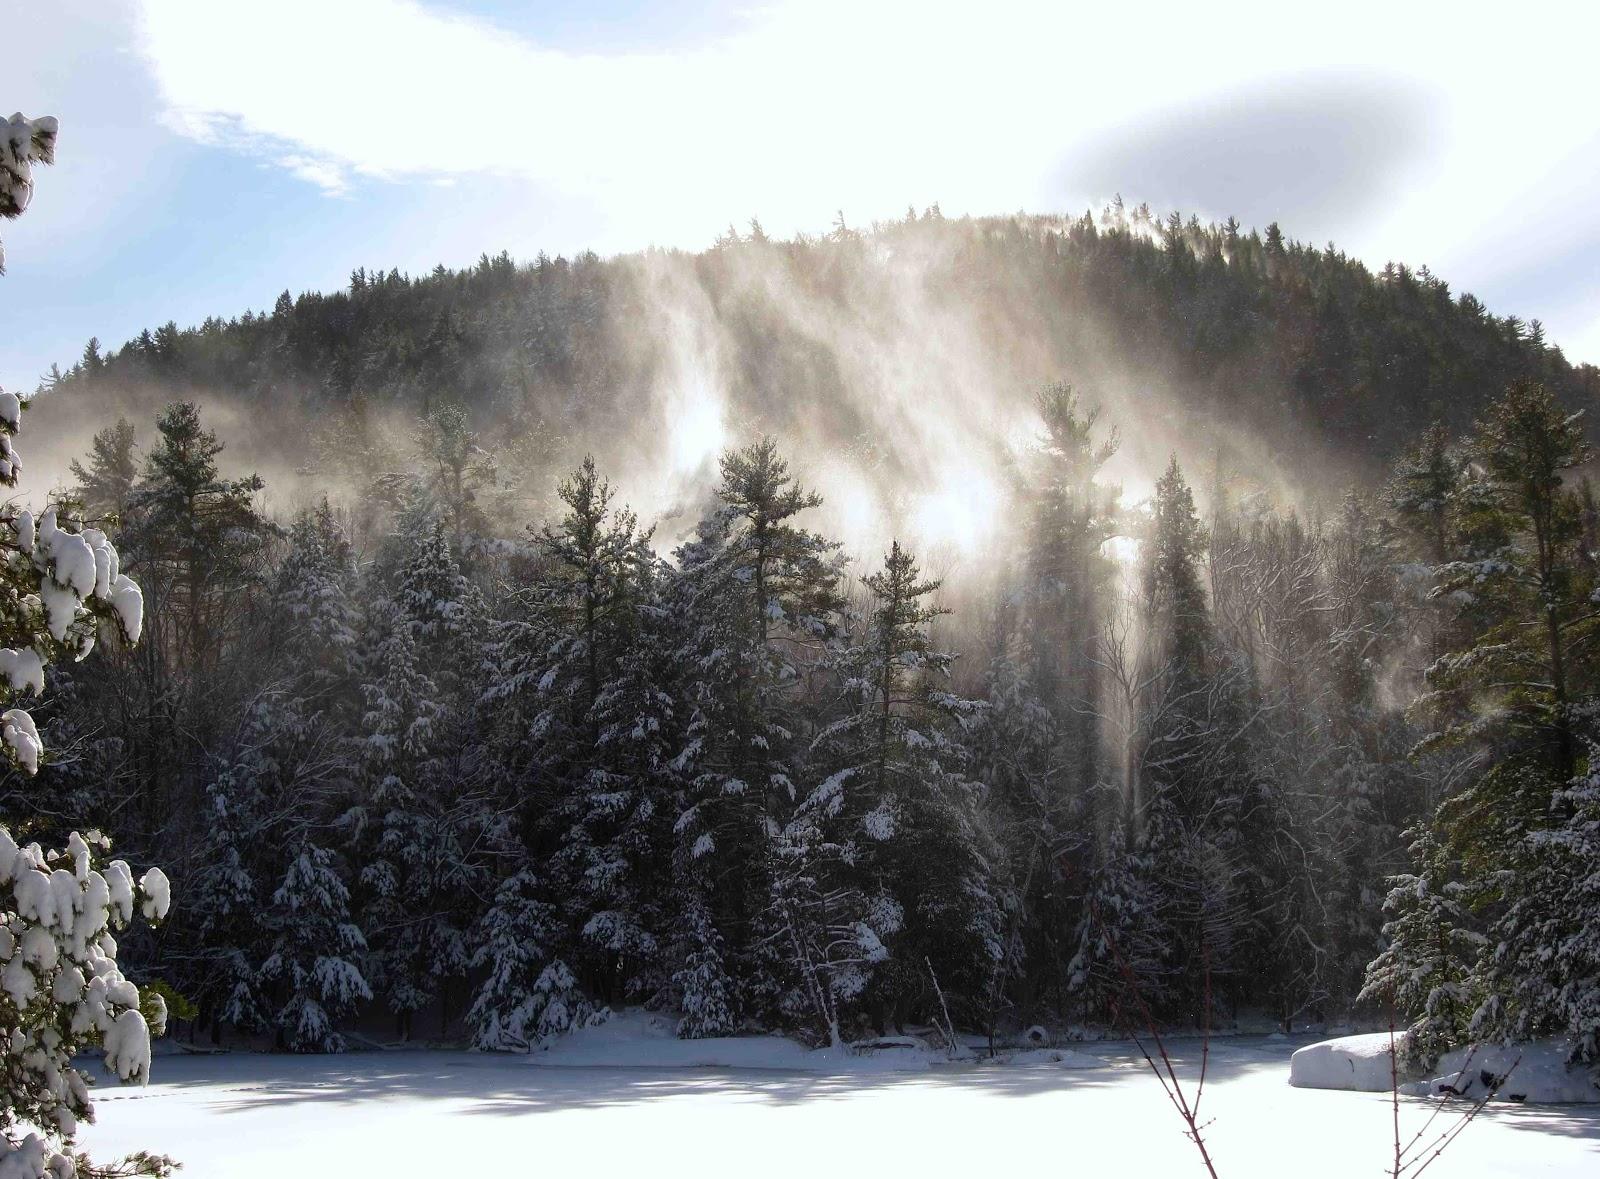 http://2.bp.blogspot.com/-8cOExhJhqHY/UODcQGPK-aI/AAAAAAAAPqA/TbqwFoocYlk/s1600/snowsmoke.jpg